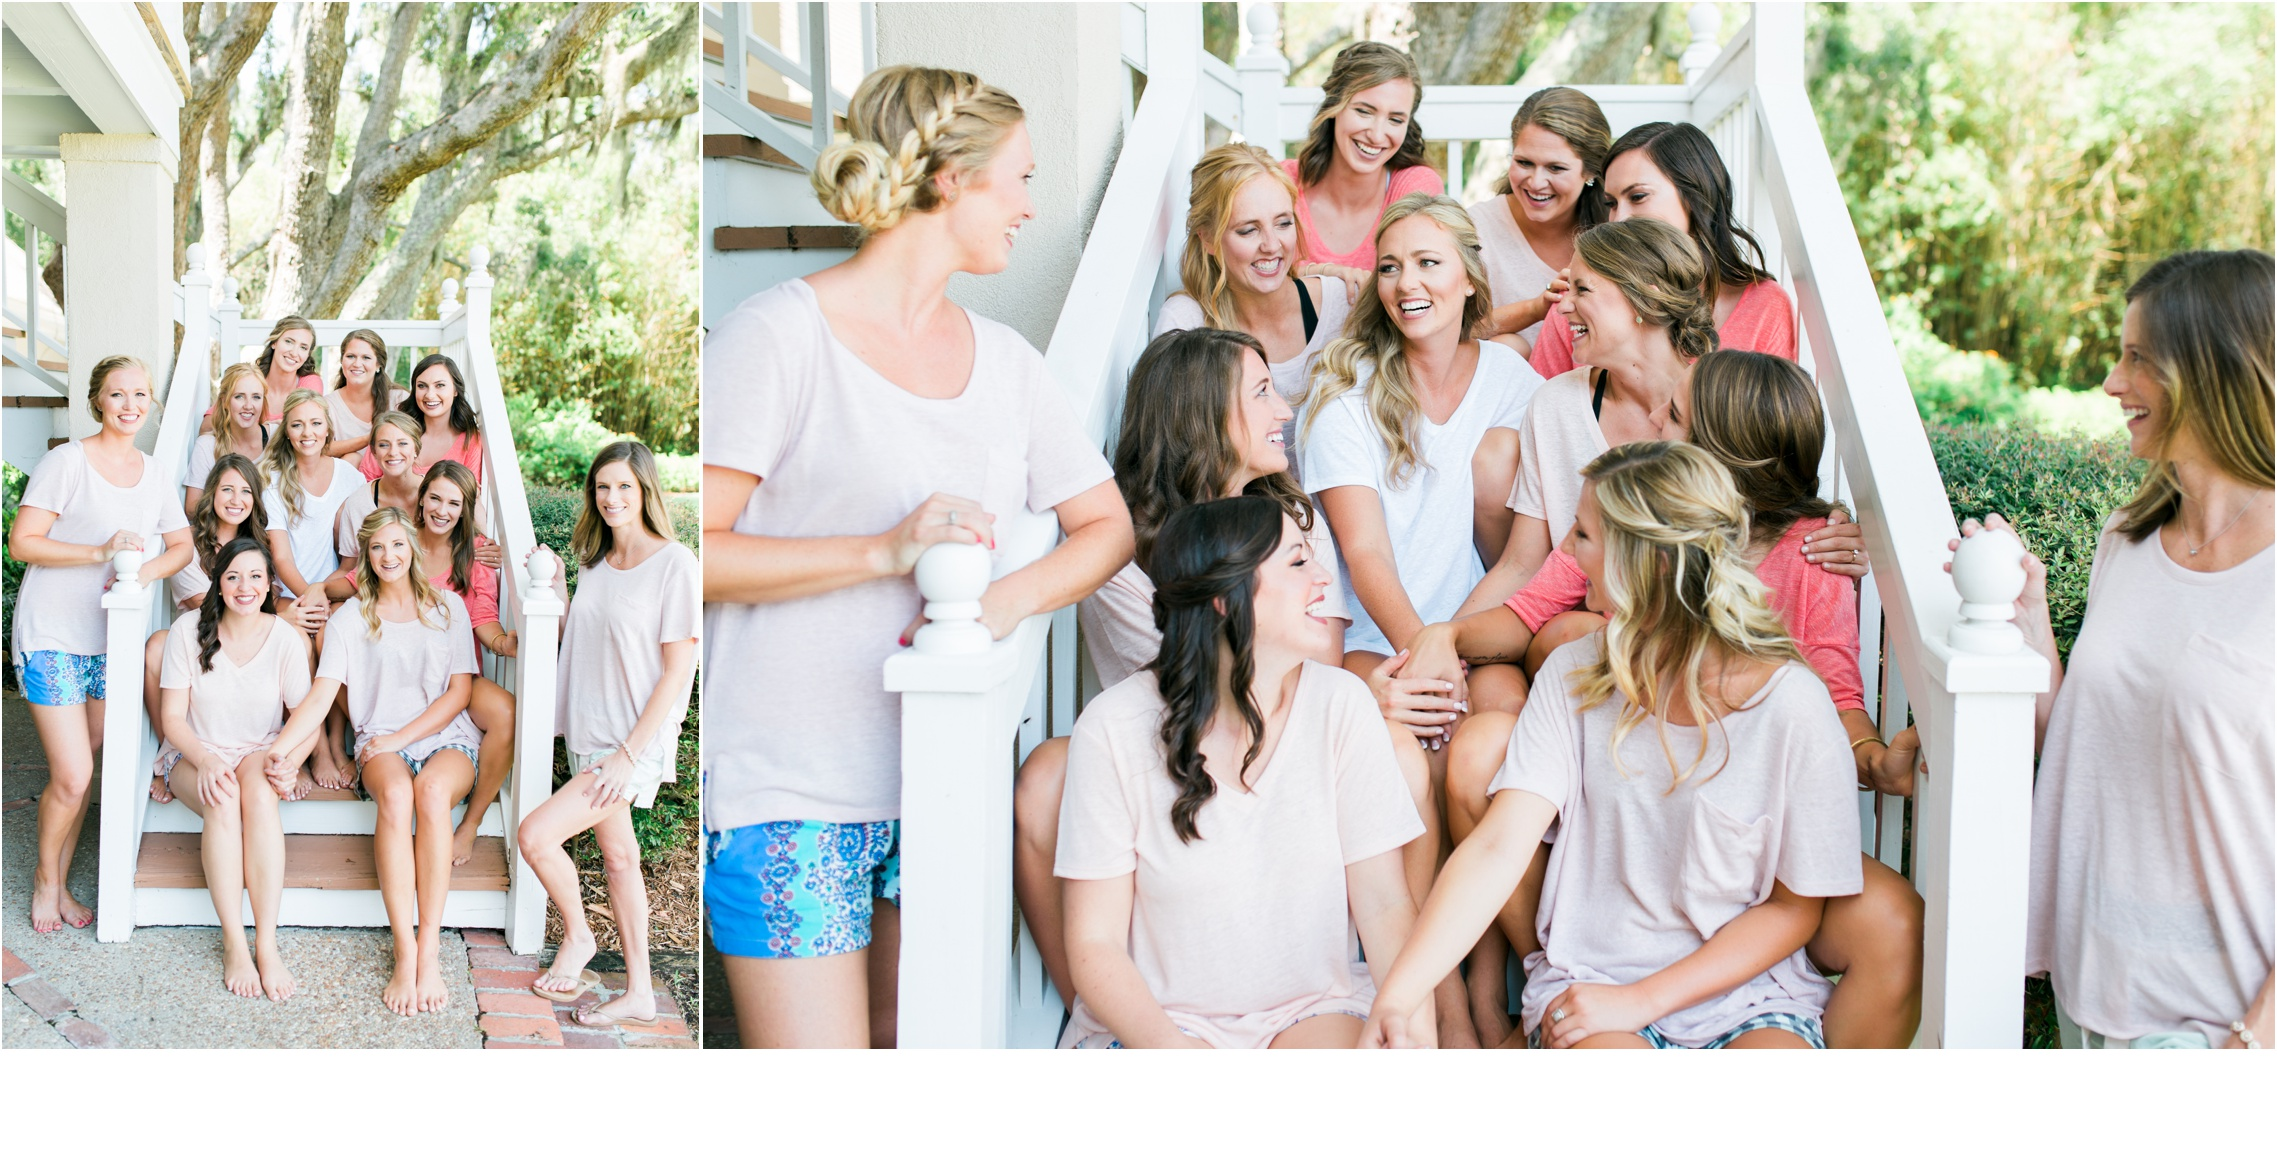 Rainey_Gregg_Photography_St._Simons_Island_Georgia_California_Wedding_Portrait_Photography_0028.jpg